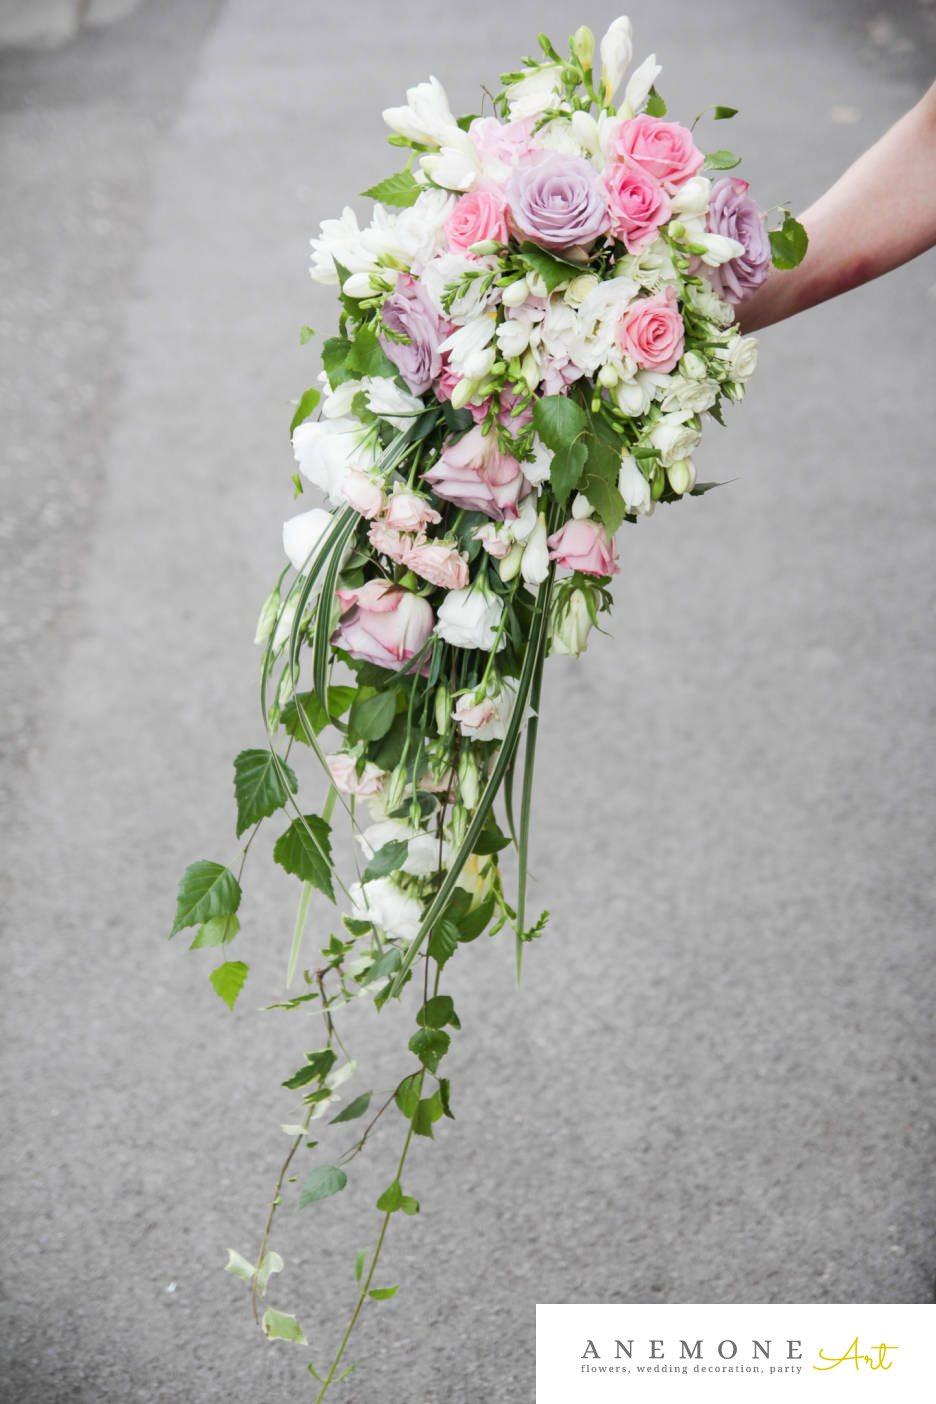 Poza, foto cu Flori de nunta alb, buchet mireasa, curgator, frezii, lisianthus, mini-rosa, mov, roz, trandafiri in Arad, Timisoara, Oradea (wedding flowers, bouquets) nunta Arad, Timisoara, Oradea